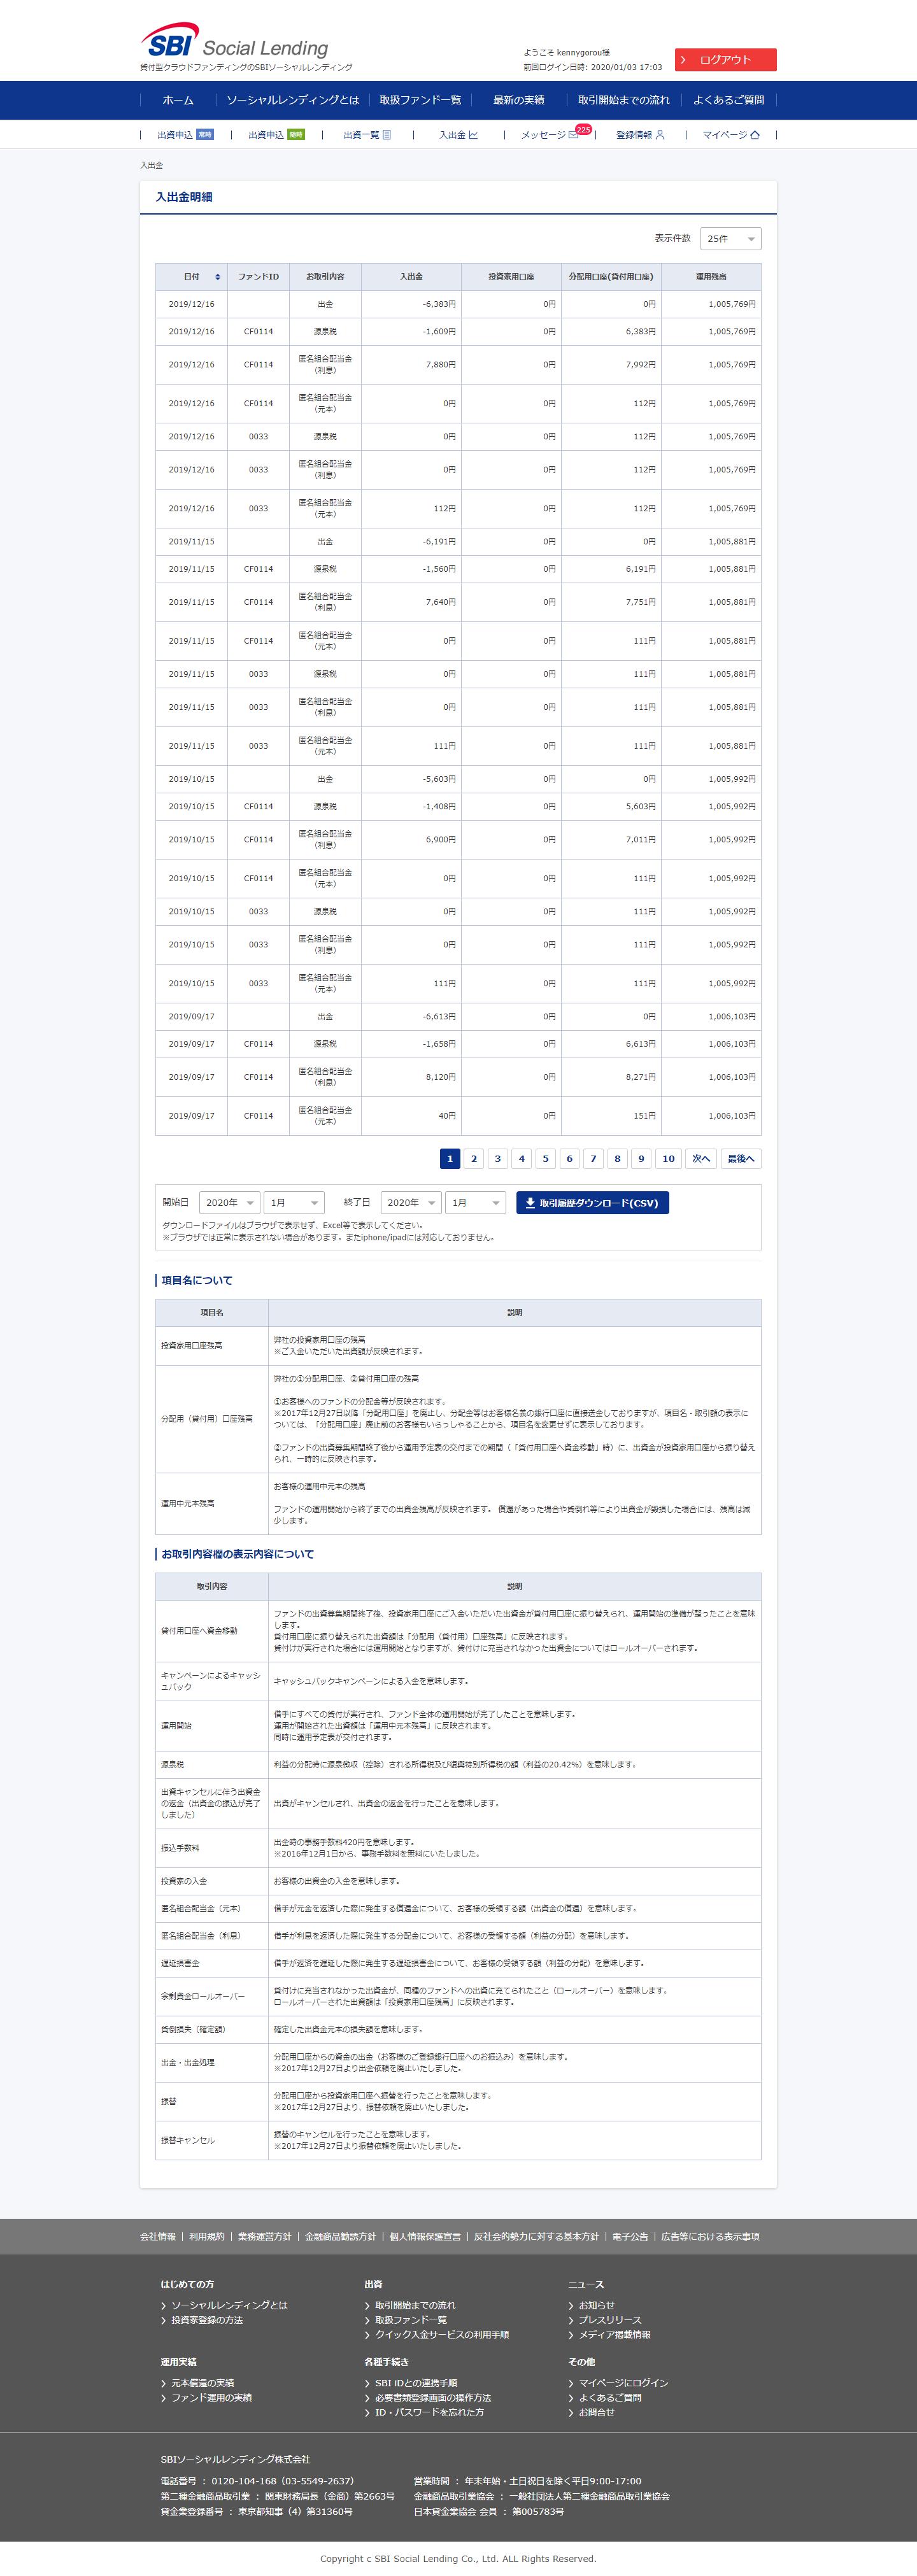 screencapture-sbi-sociallending-jp-accounthistory-display-transactions-2020-01-03-21_43_03.png